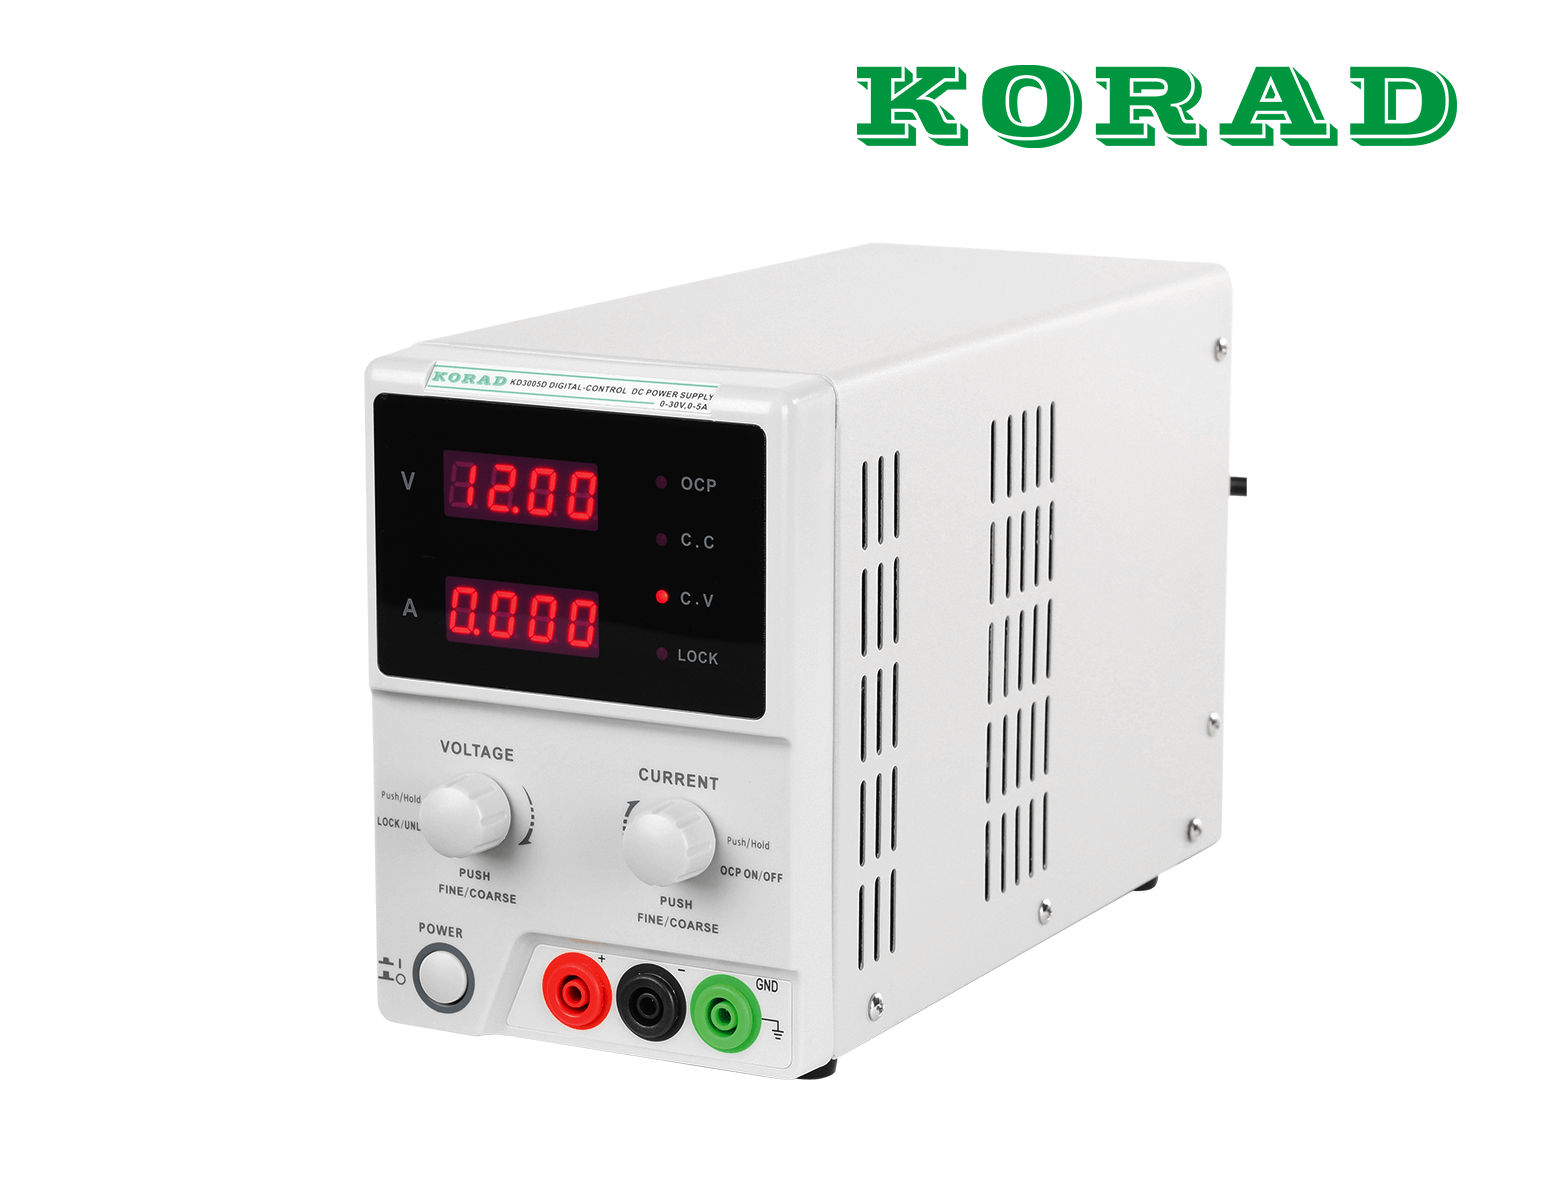 Labornetzgerät, 0 - 30 V, 0 - 5 A, stabilisiert